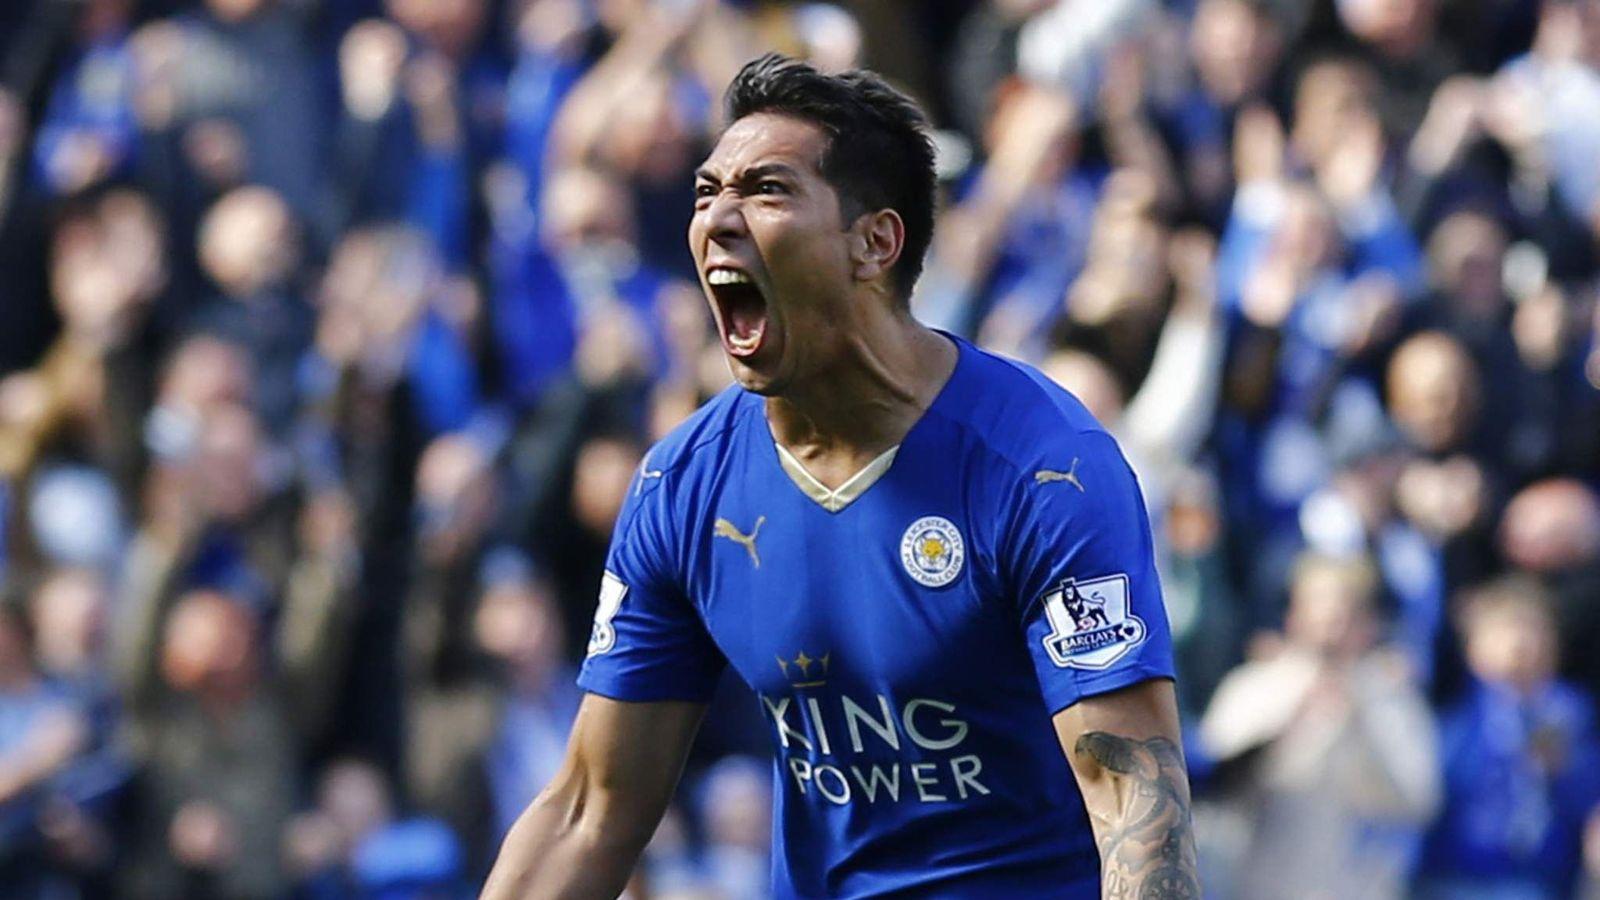 Leonardo Ulloa celebrates scoring the second goal for Leicester